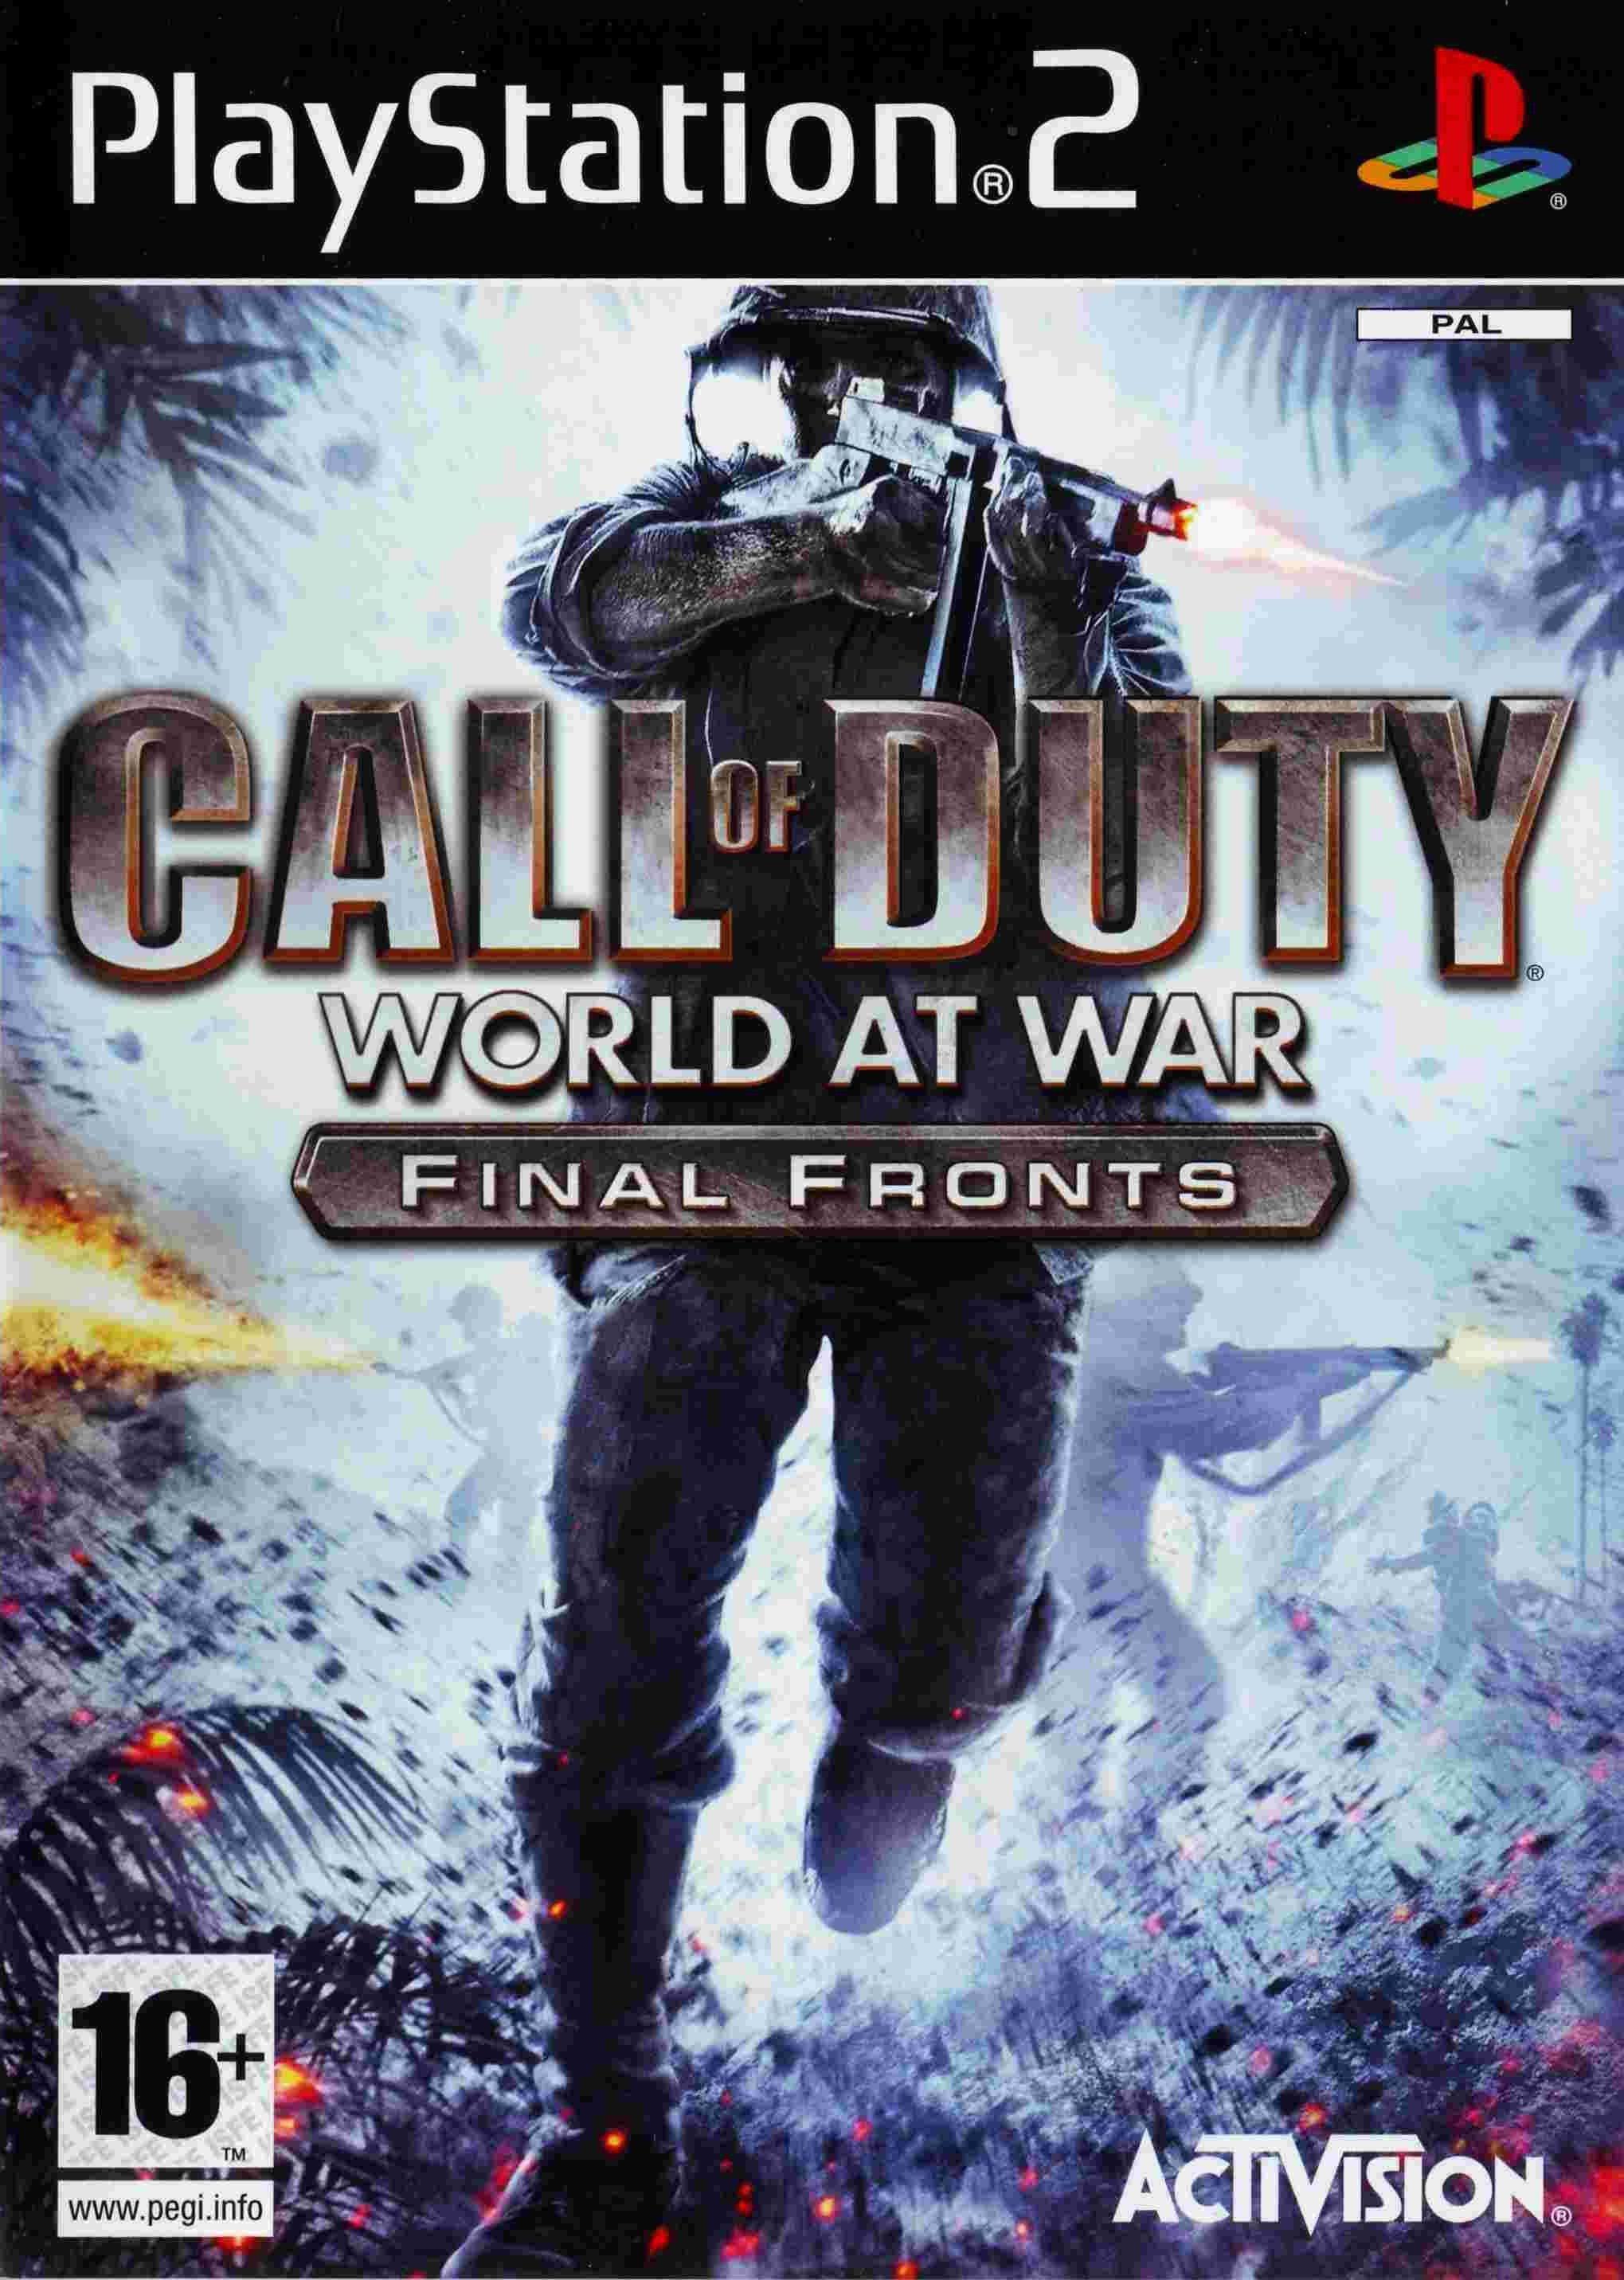 Call Of Duty World At War Final Fronts Jogos Pc Jogos De Playstation Jogos Ps2